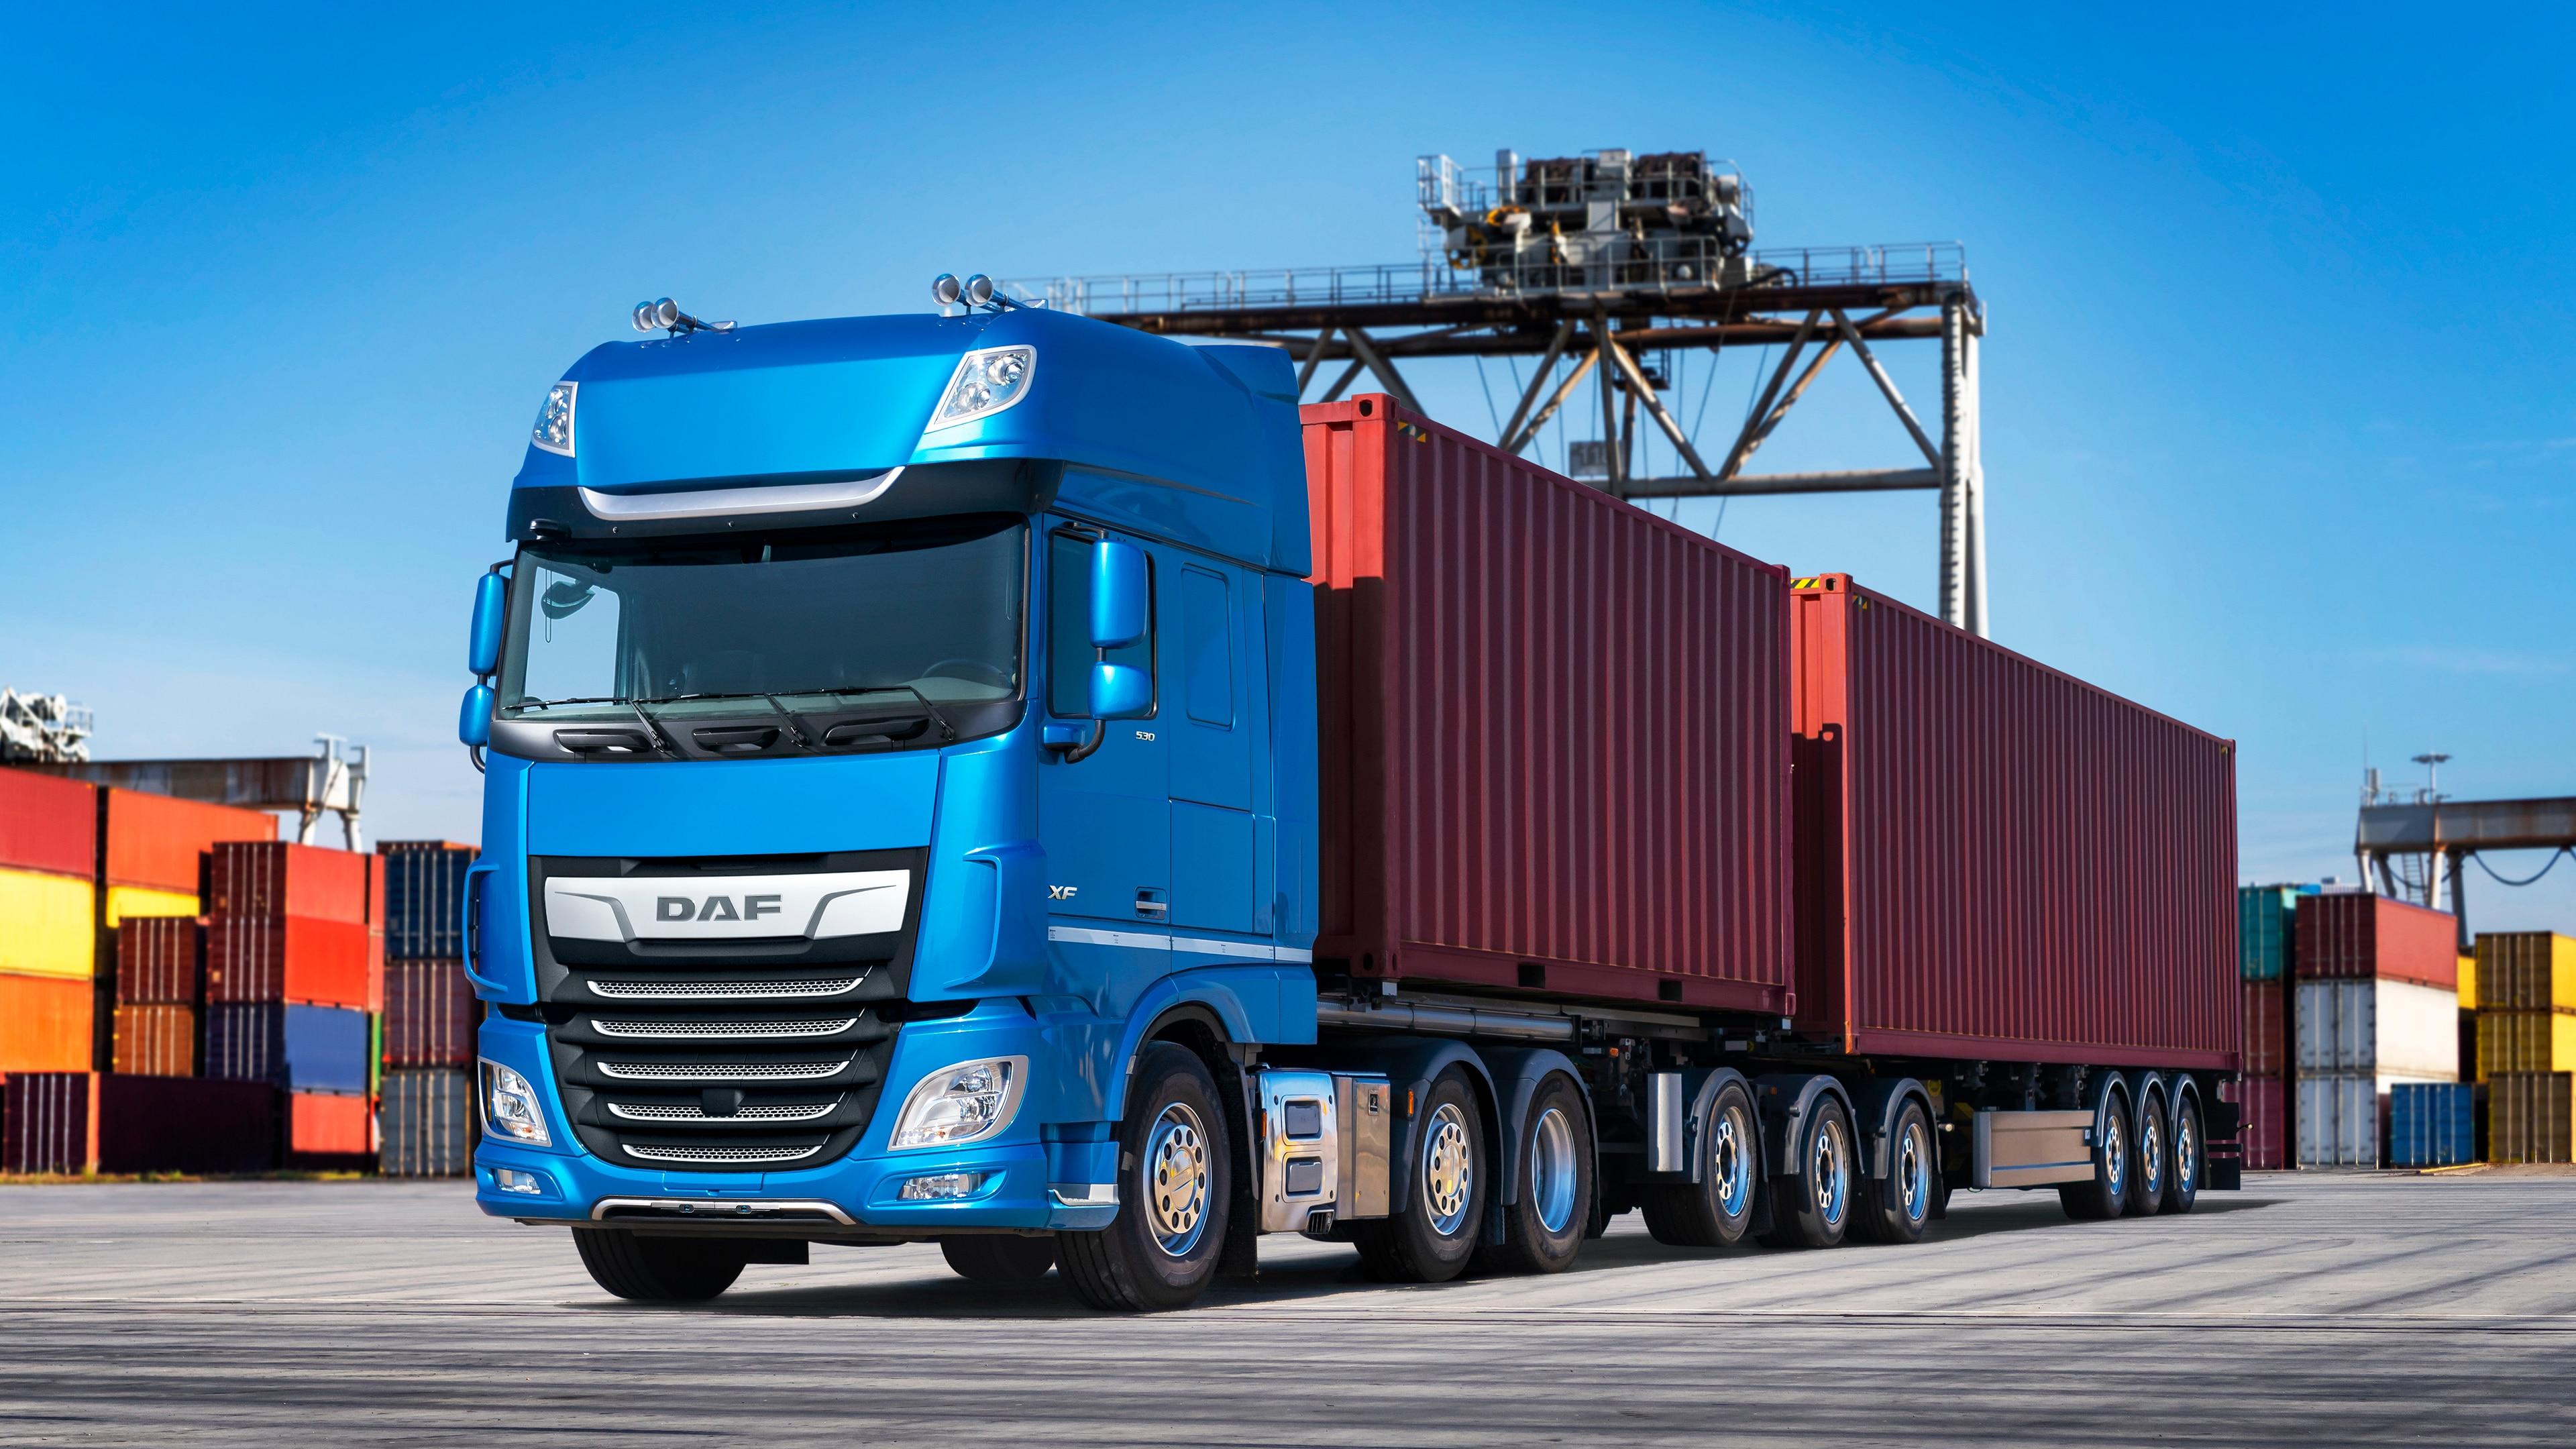 Nova cabine DAF chega este mês ao Brasil